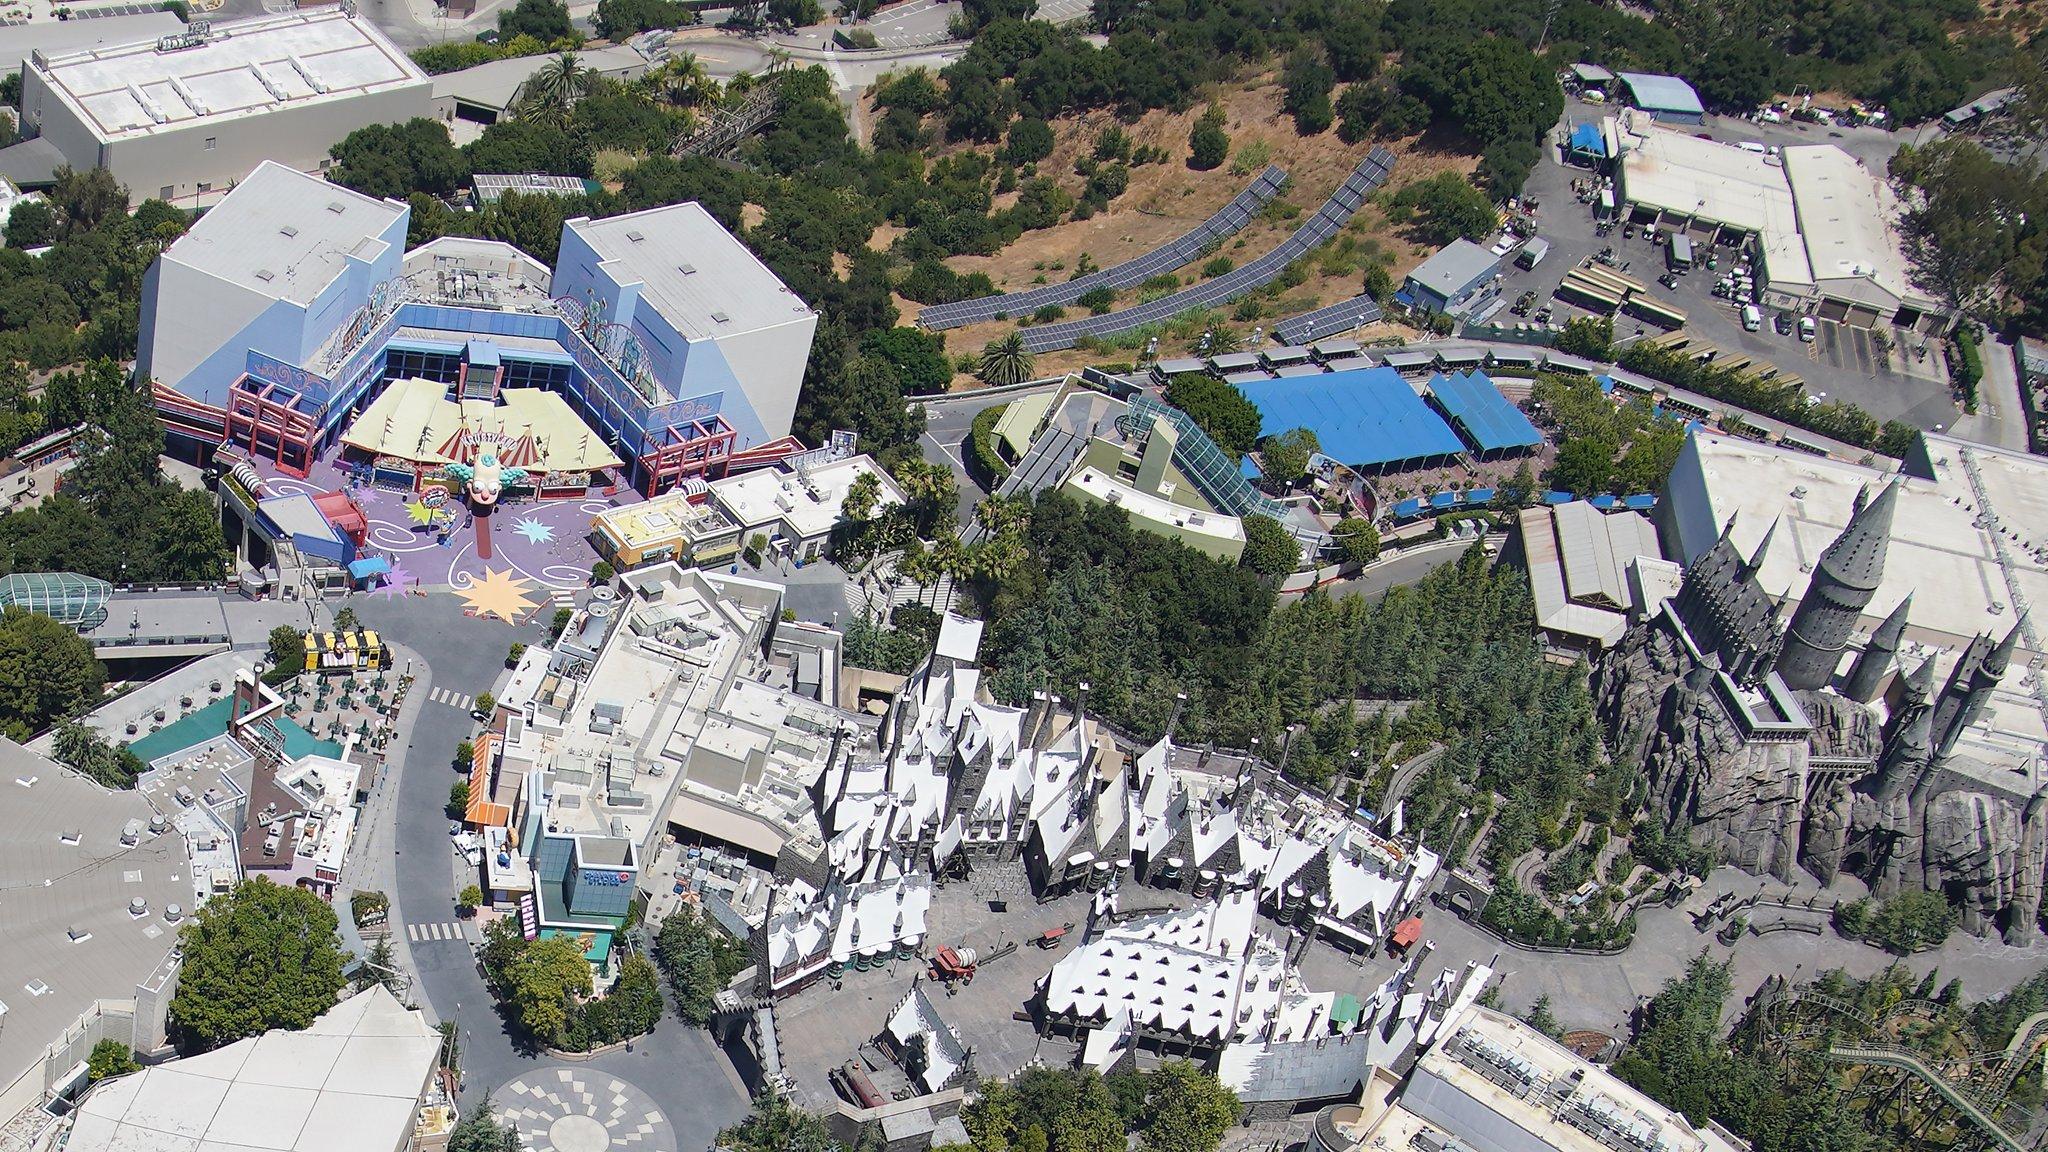 Universal Studios Hollywood [USA - 1964] - Page 21 Ecre-jUXgAIbKie?format=jpg&name=large